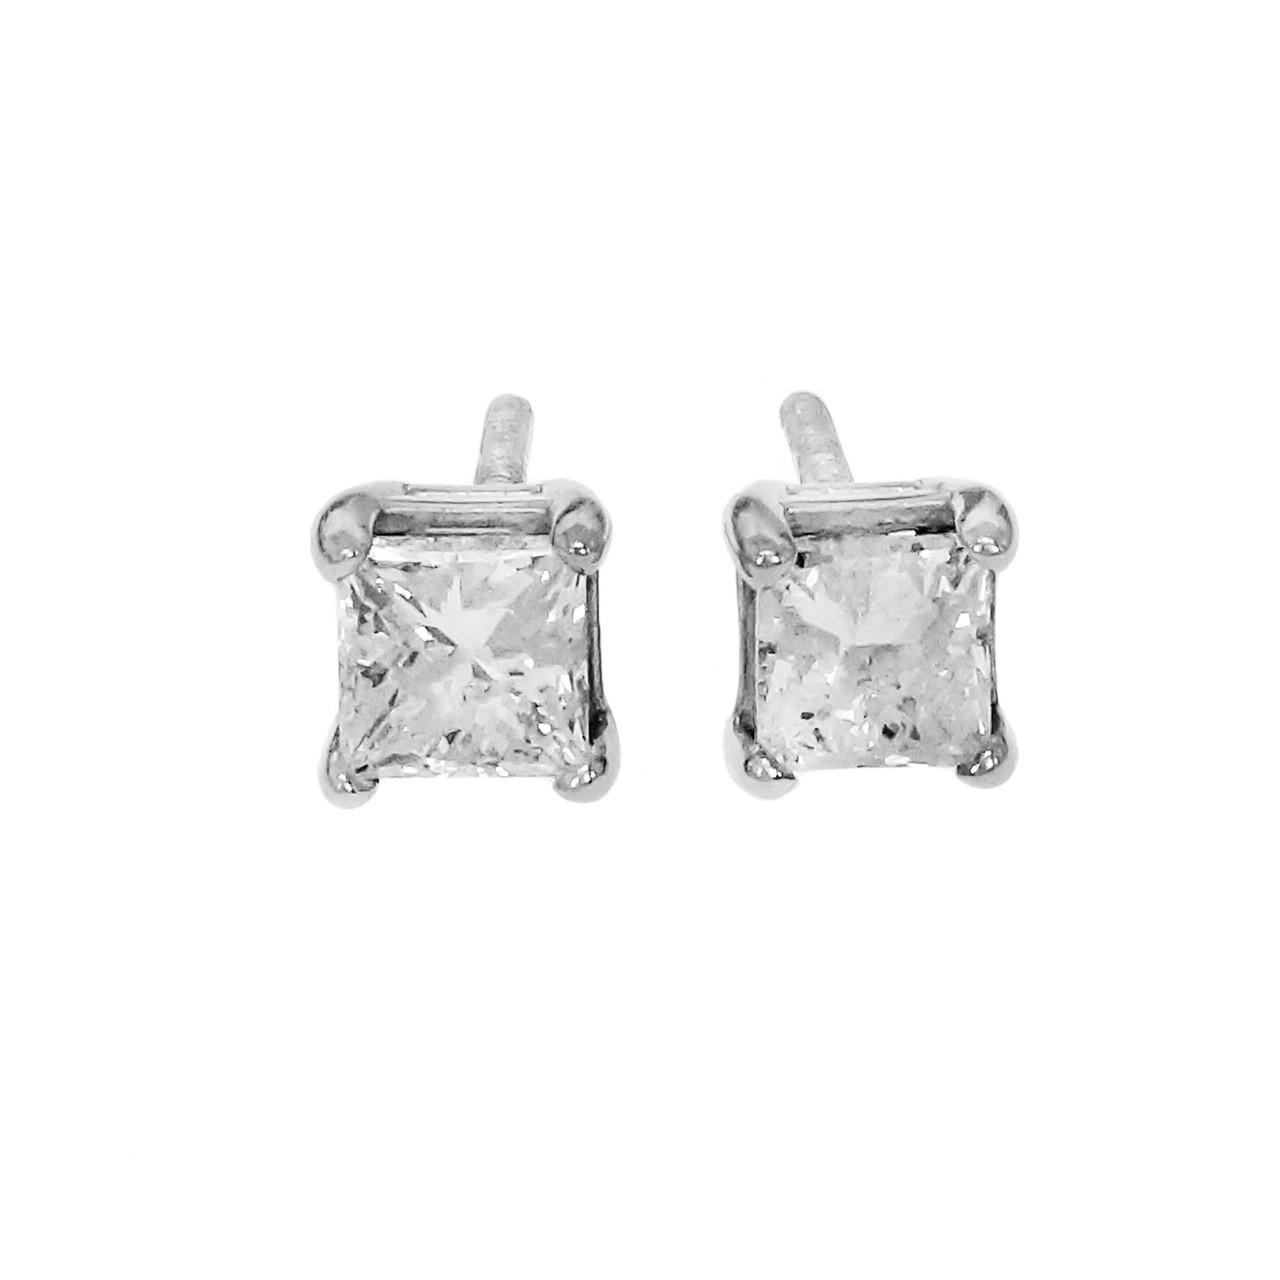 2bb34a1e5 Princess Cut Diamond Stud Earrings 14k White Gold Screw Back .50ct -  petersuchyjewelers